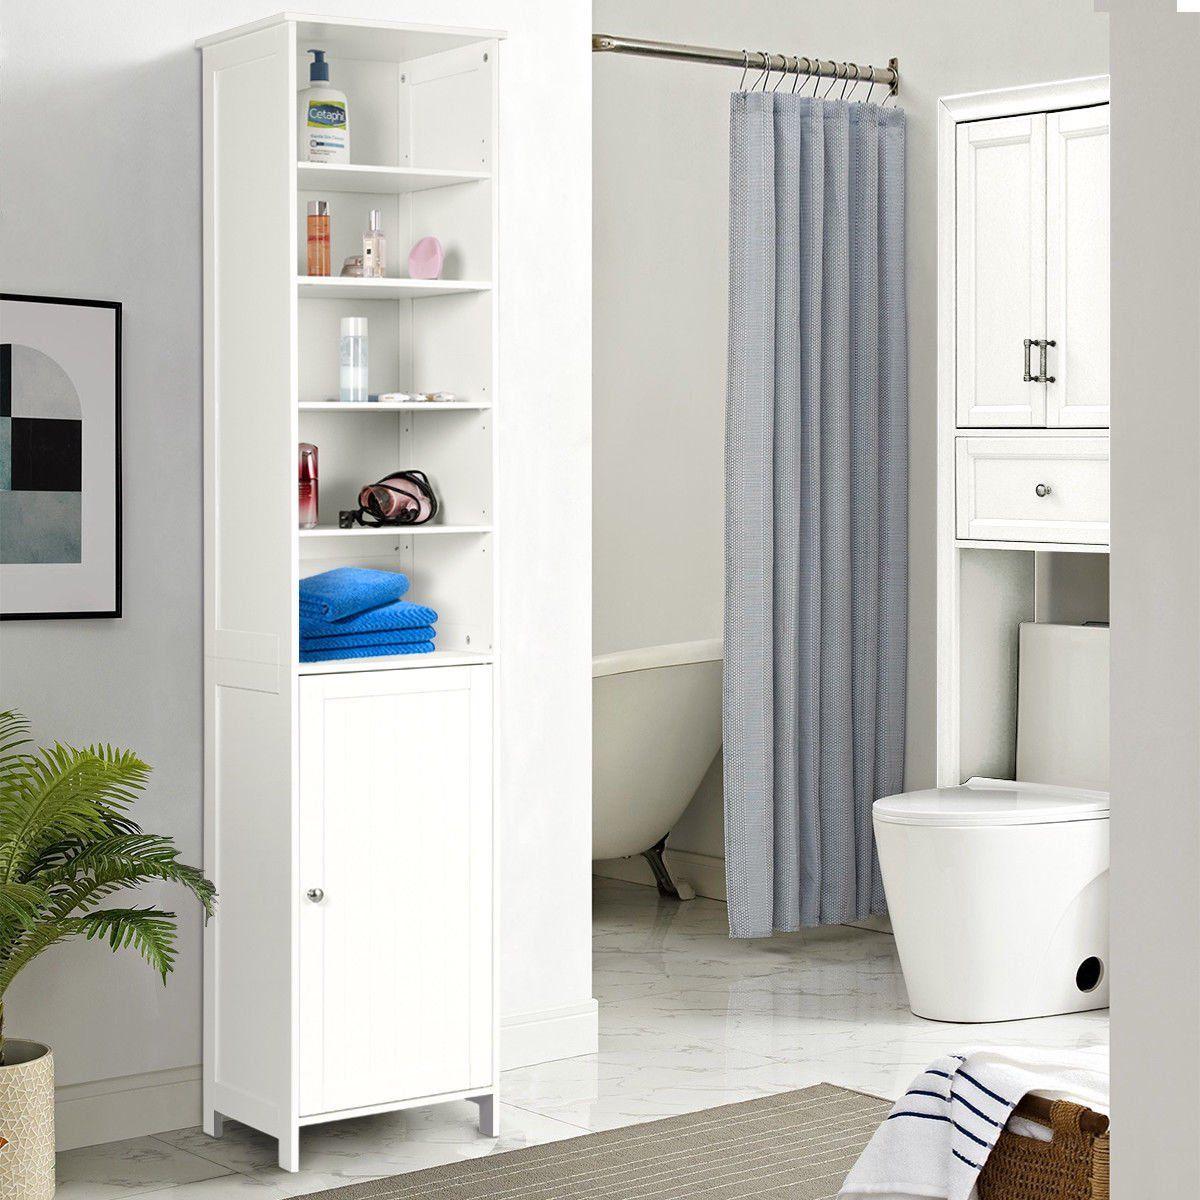 Costway 5 Shelf 72 Inch Tall Bathroom Storage Floor Cabinet Free Standing Walmart Com Walm In 2020 Tall Bathroom Storage Bathroom Standing Cabinet Storage Shelves